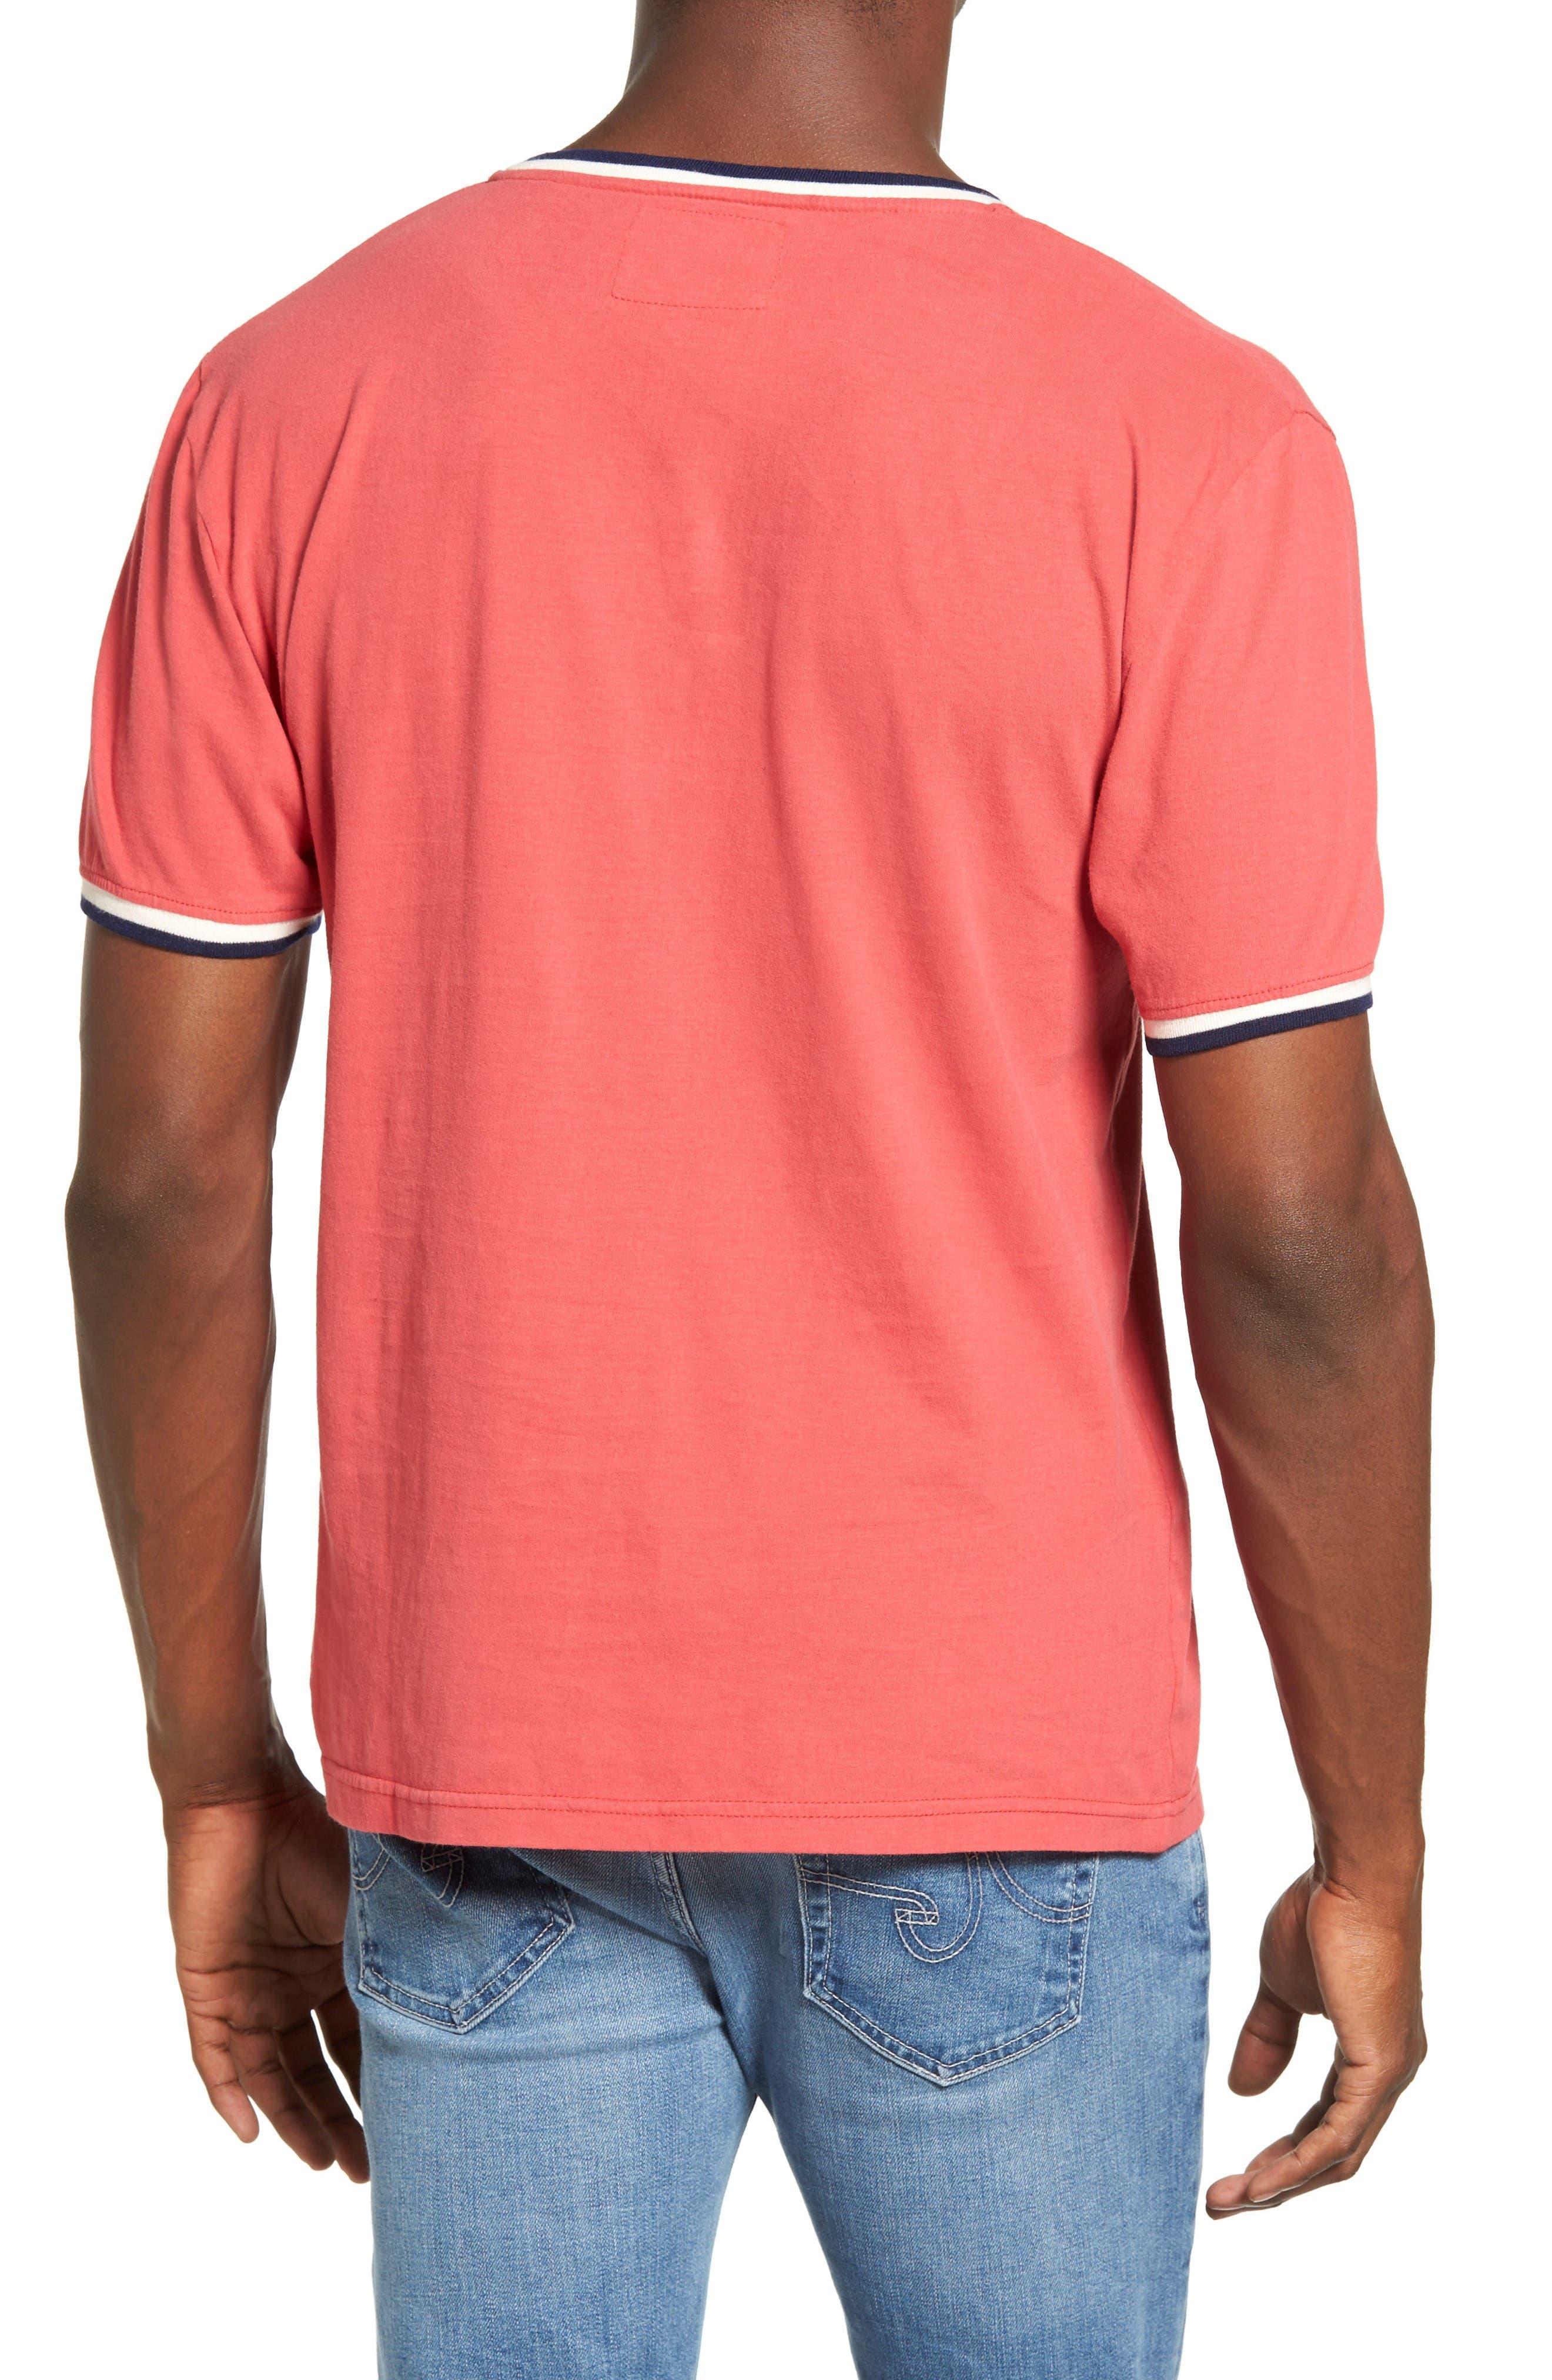 Eastwood St. Louis Cardinals T-Shirt,                             Alternate thumbnail 2, color,                             Red